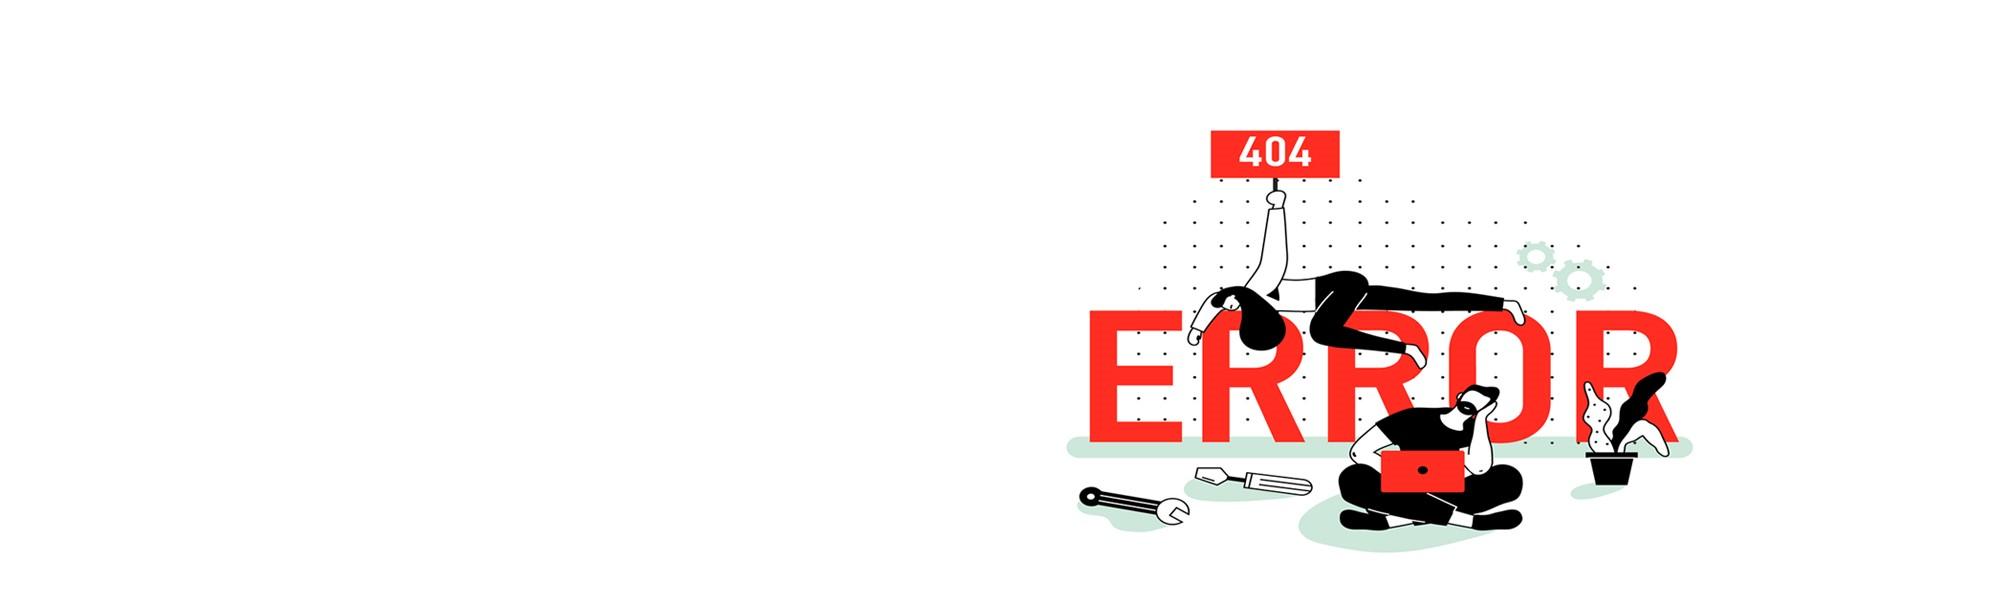 neden-404-hatasi-olusur